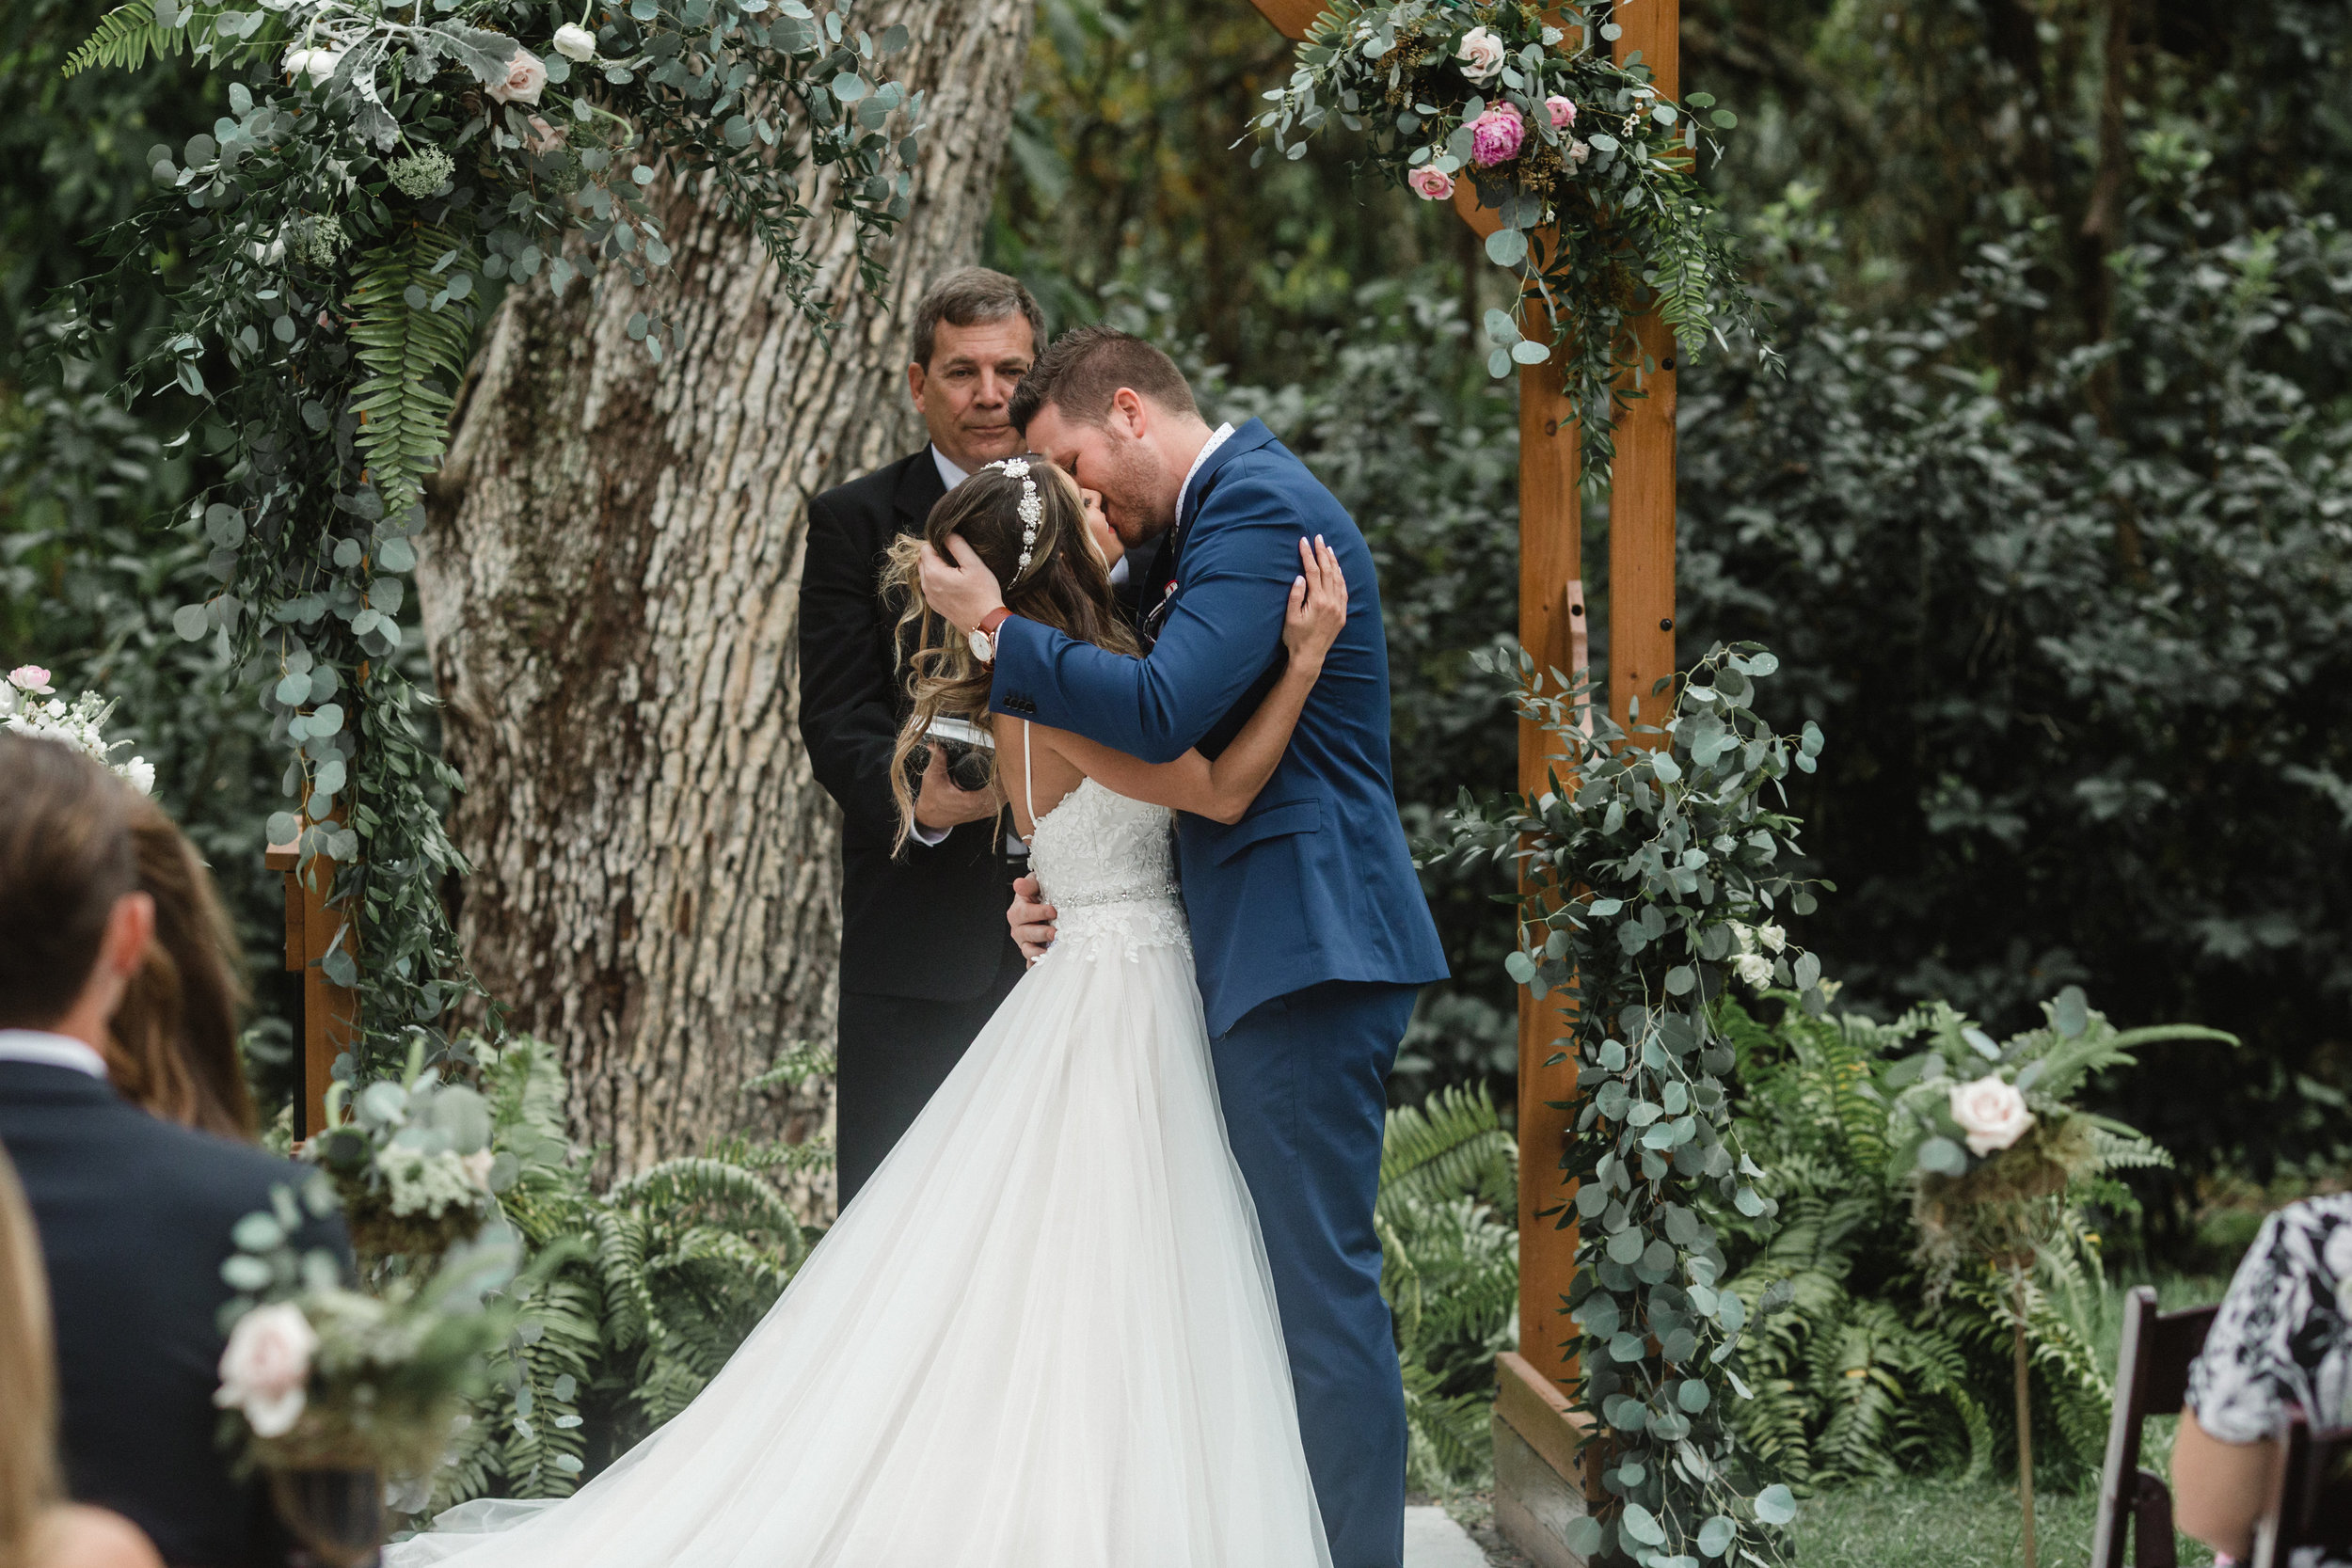 Danielle_Andrew_Wedding_Tomlinson-8996.jpg